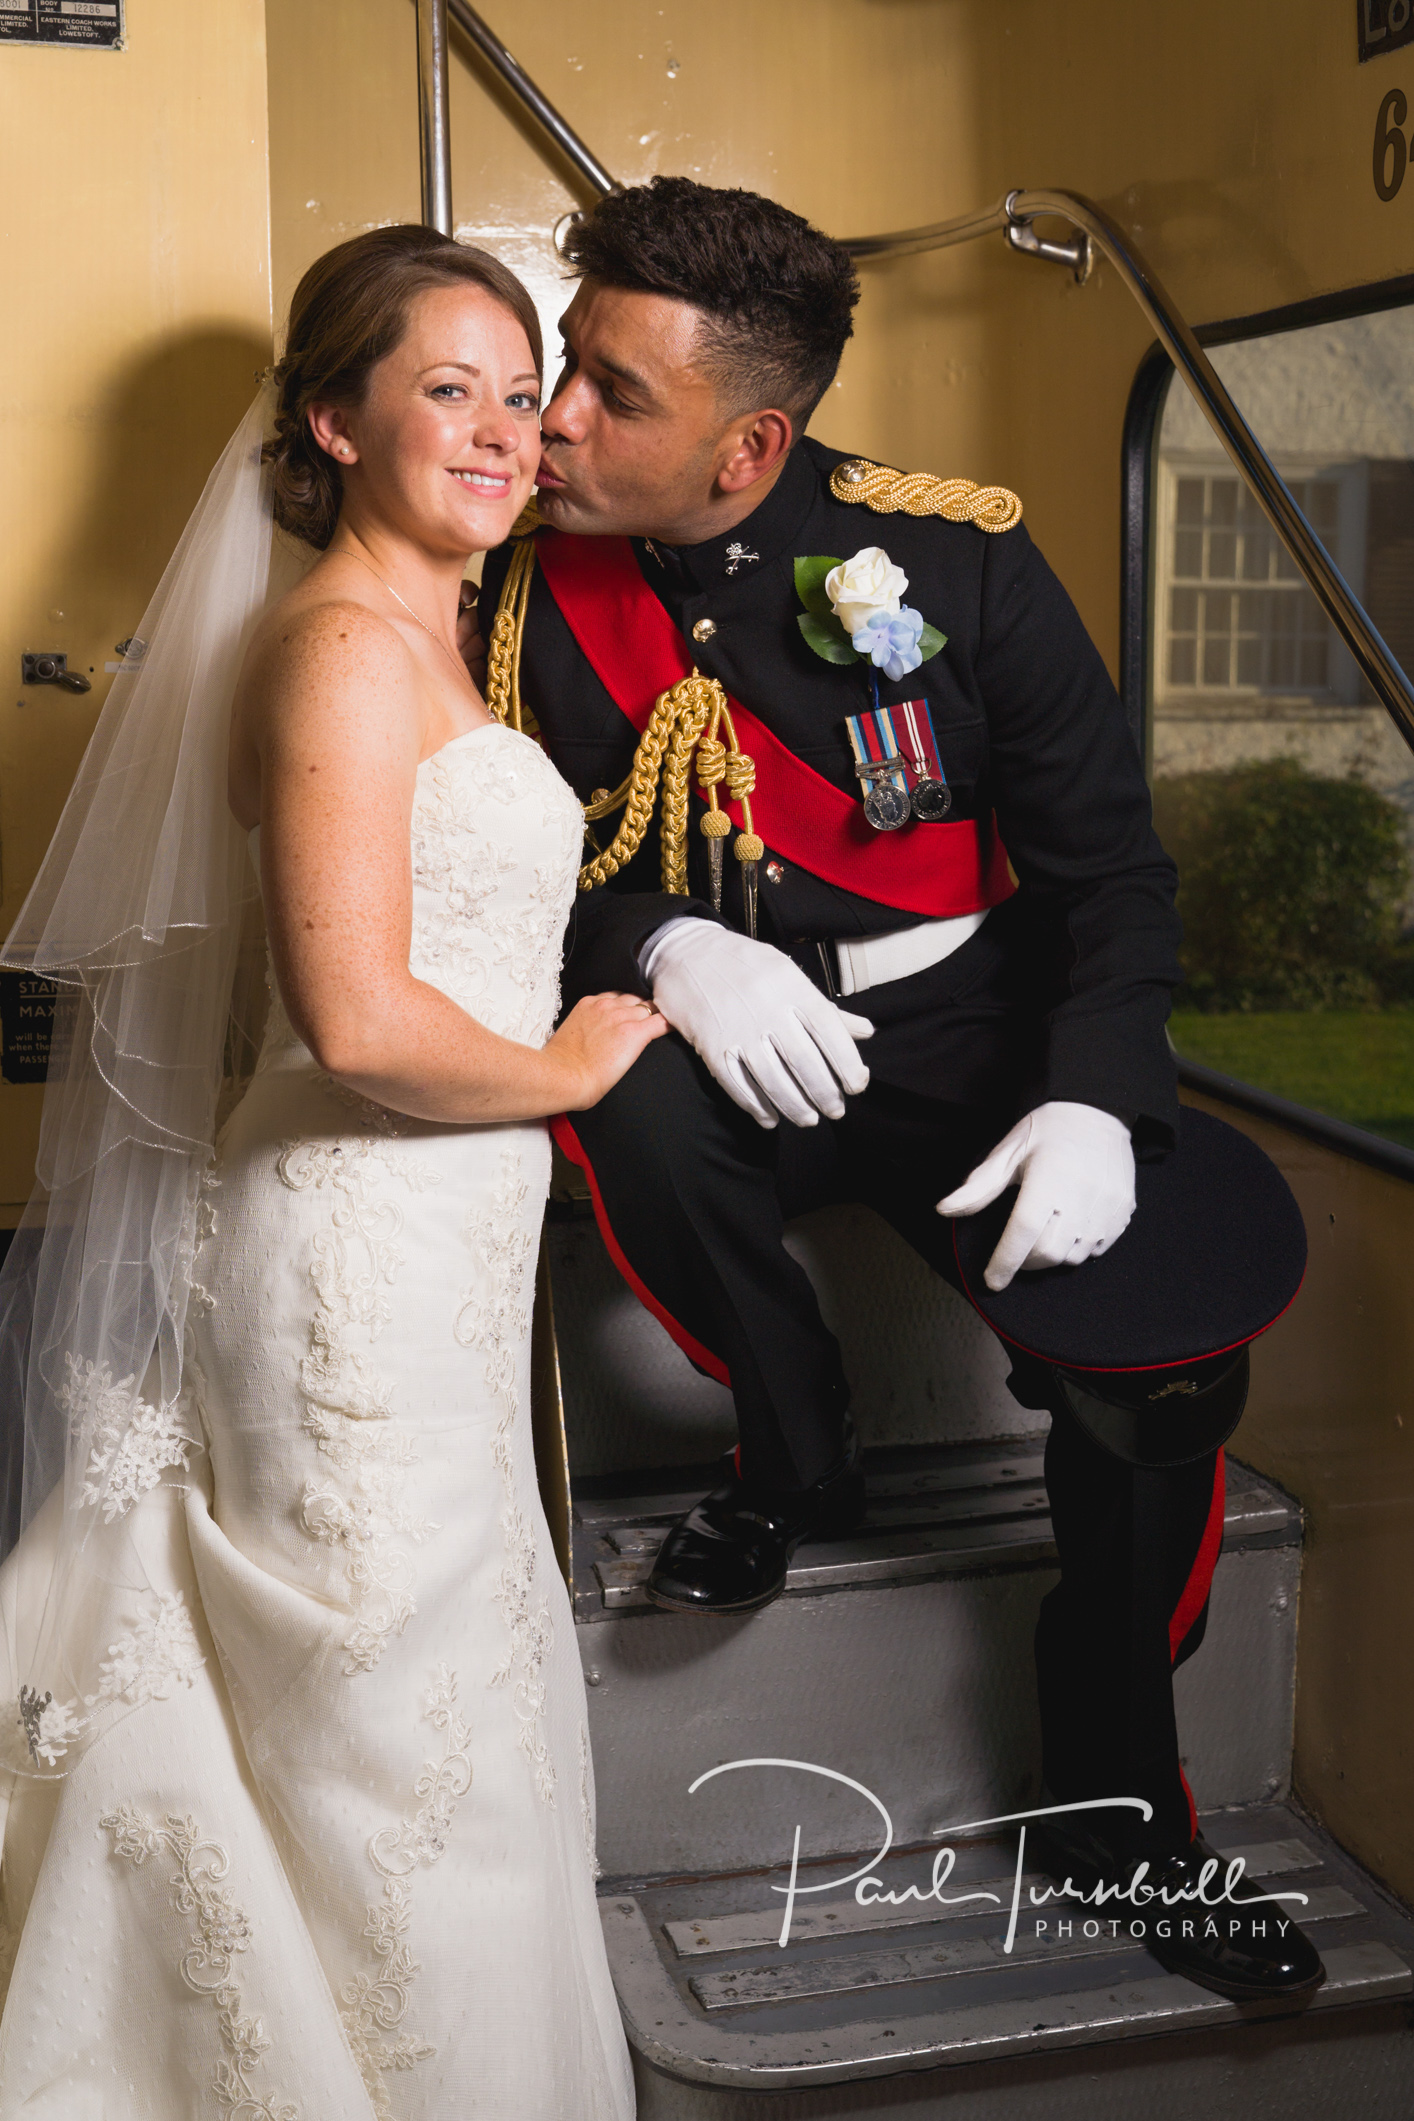 wedding-photographer-south-dalton-walkington-yorkshire-emma-james-072.jpg